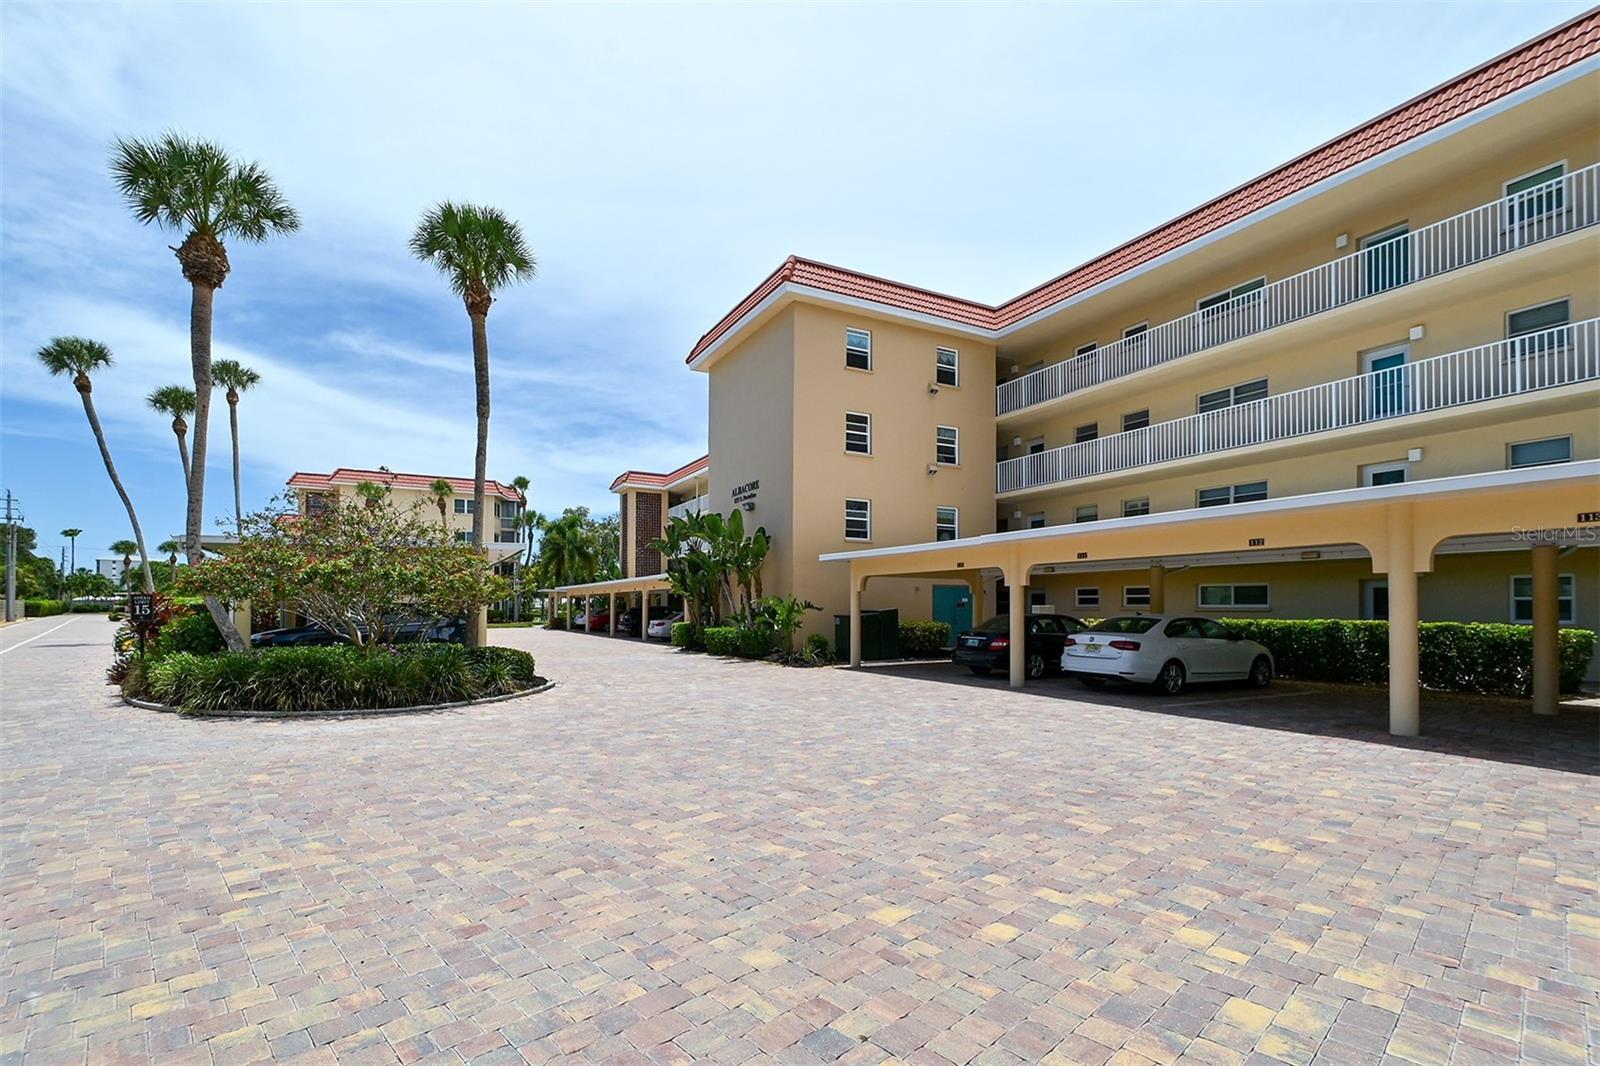 1257 S Portofino Drive #36, Sarasota FL 34242 - Photo 2